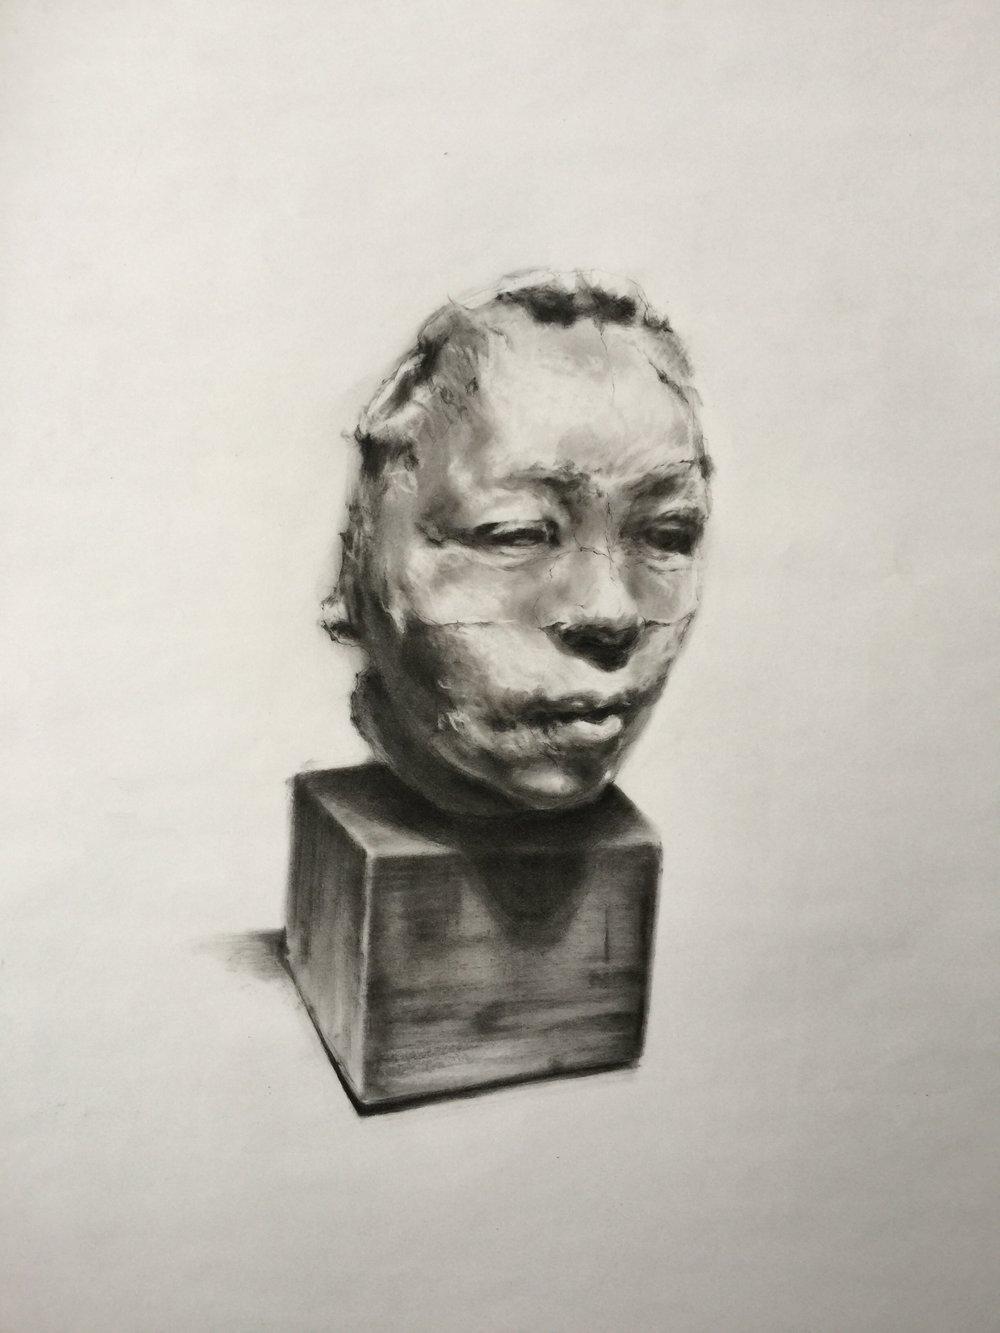 Agnes_Grochulska_Synthesis_Hanako_2_charcoal_18x24.JPG